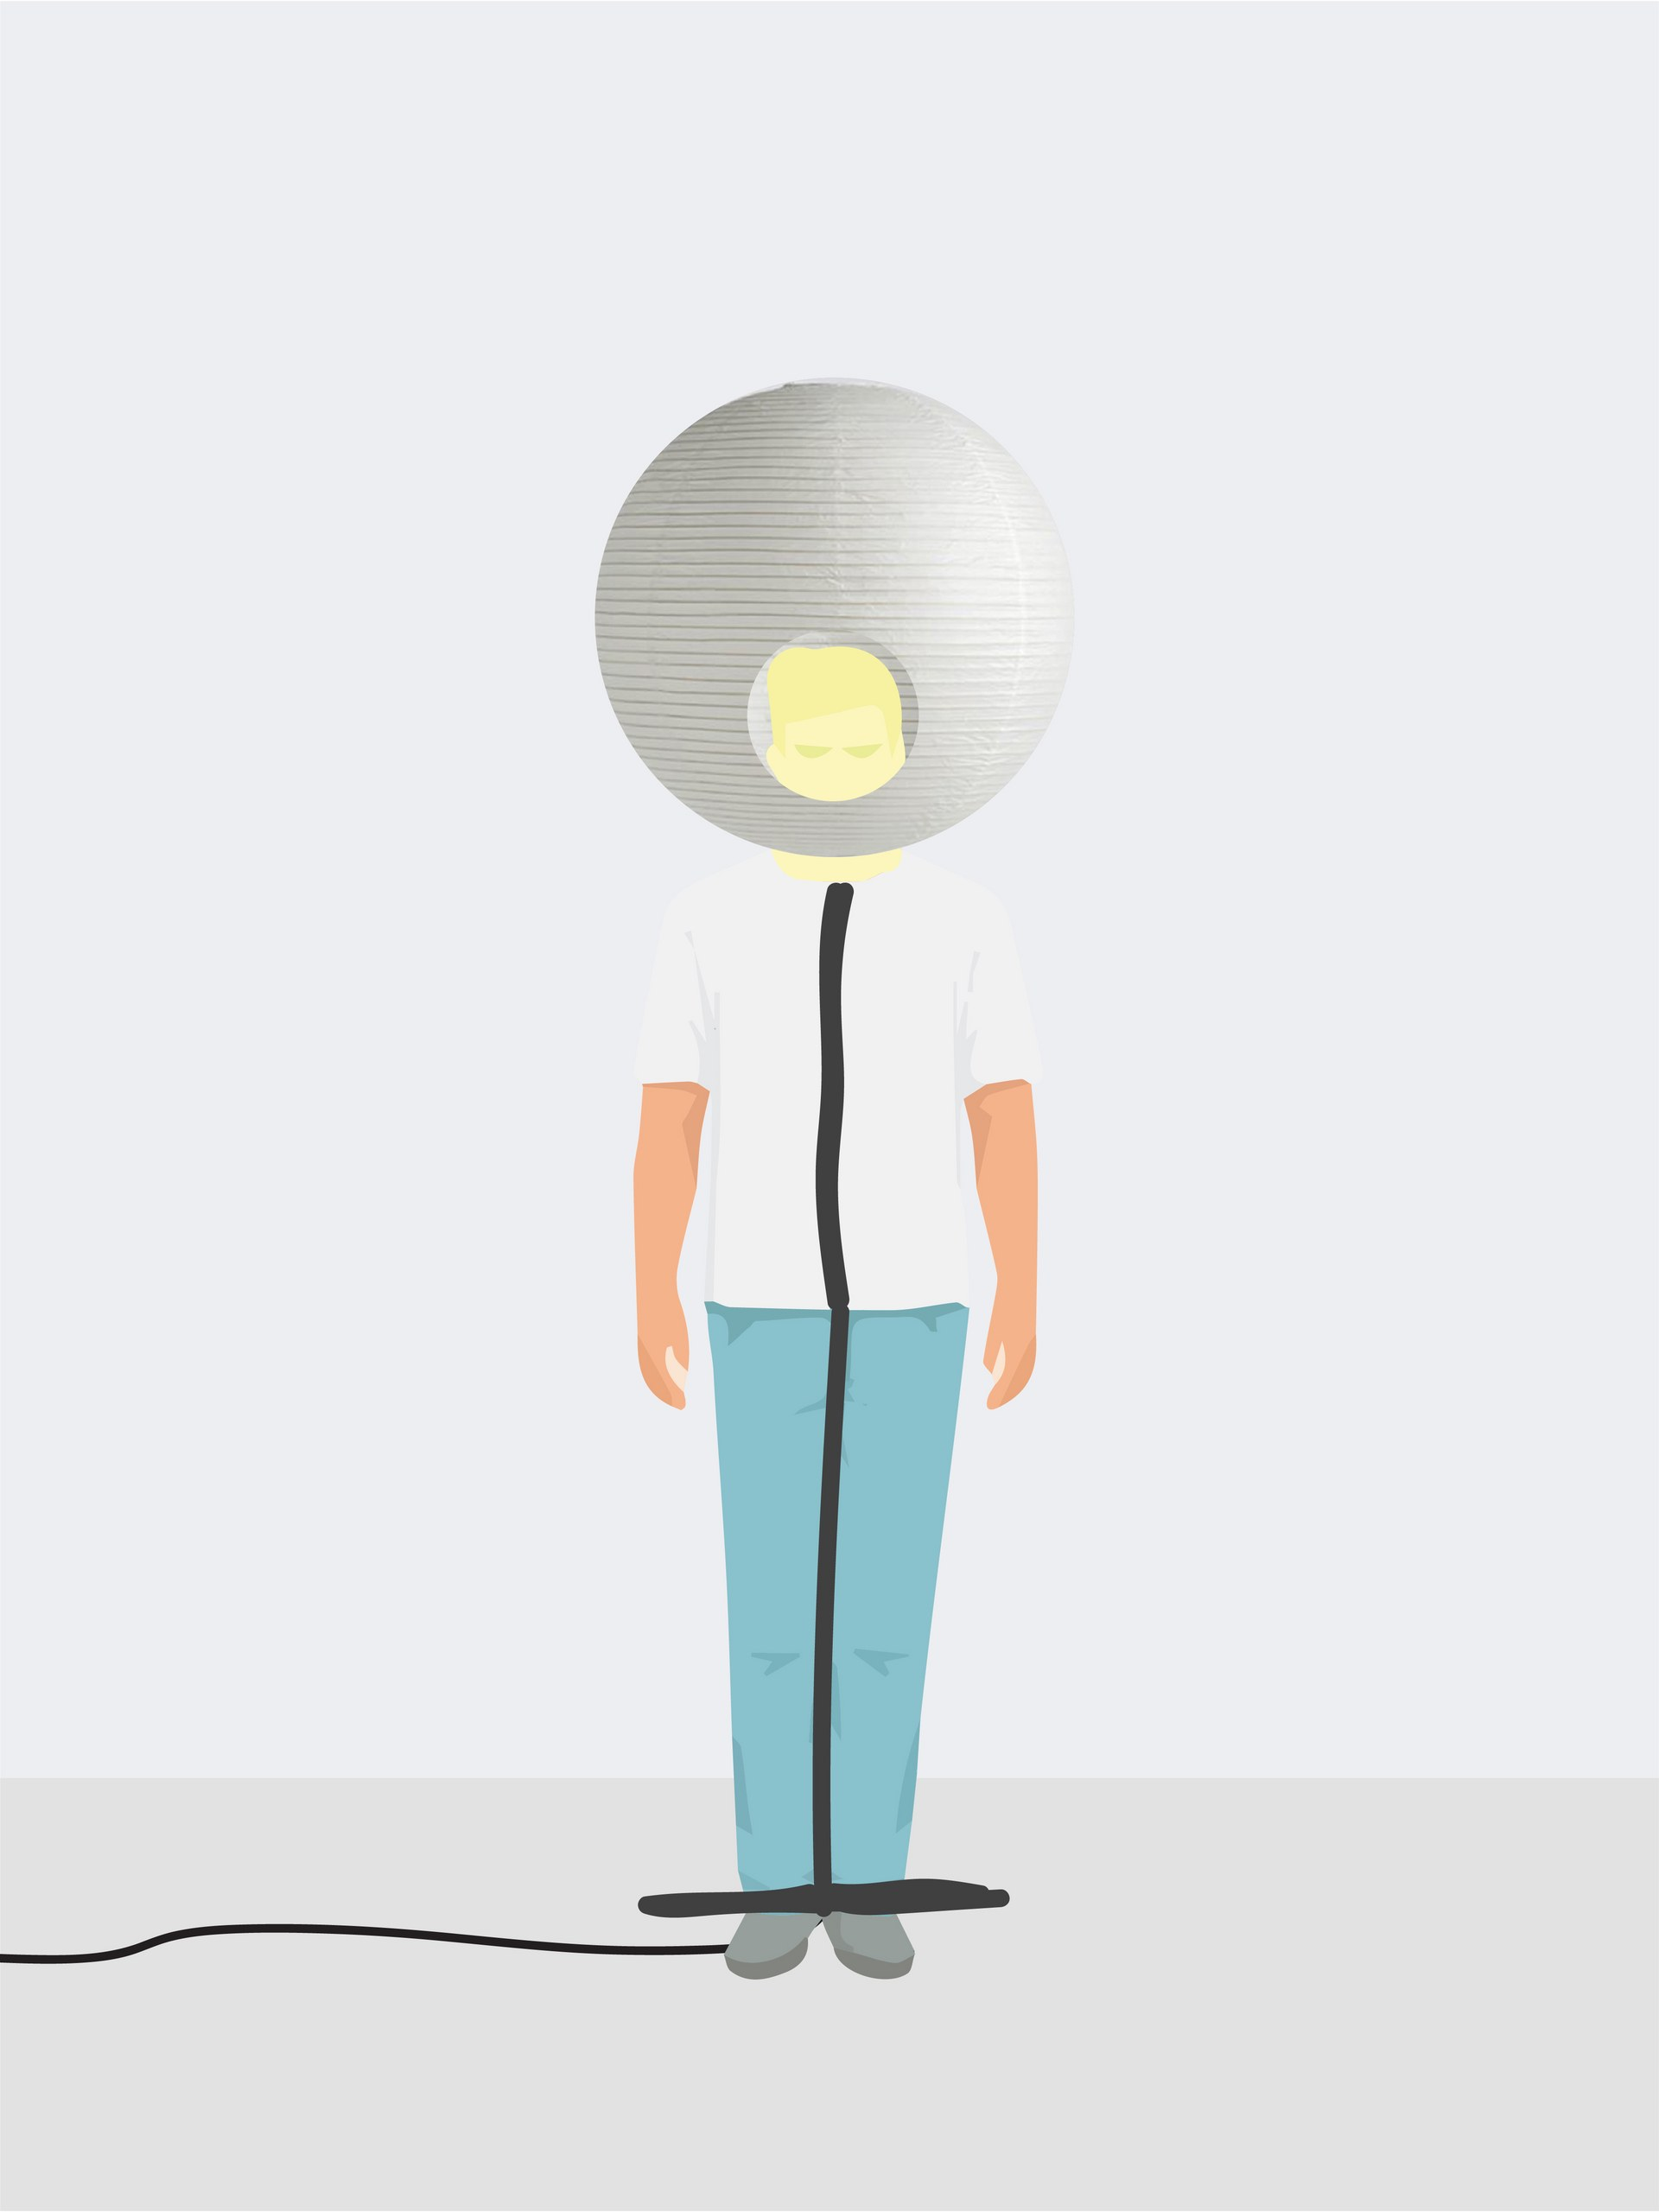 Becoming Lamp